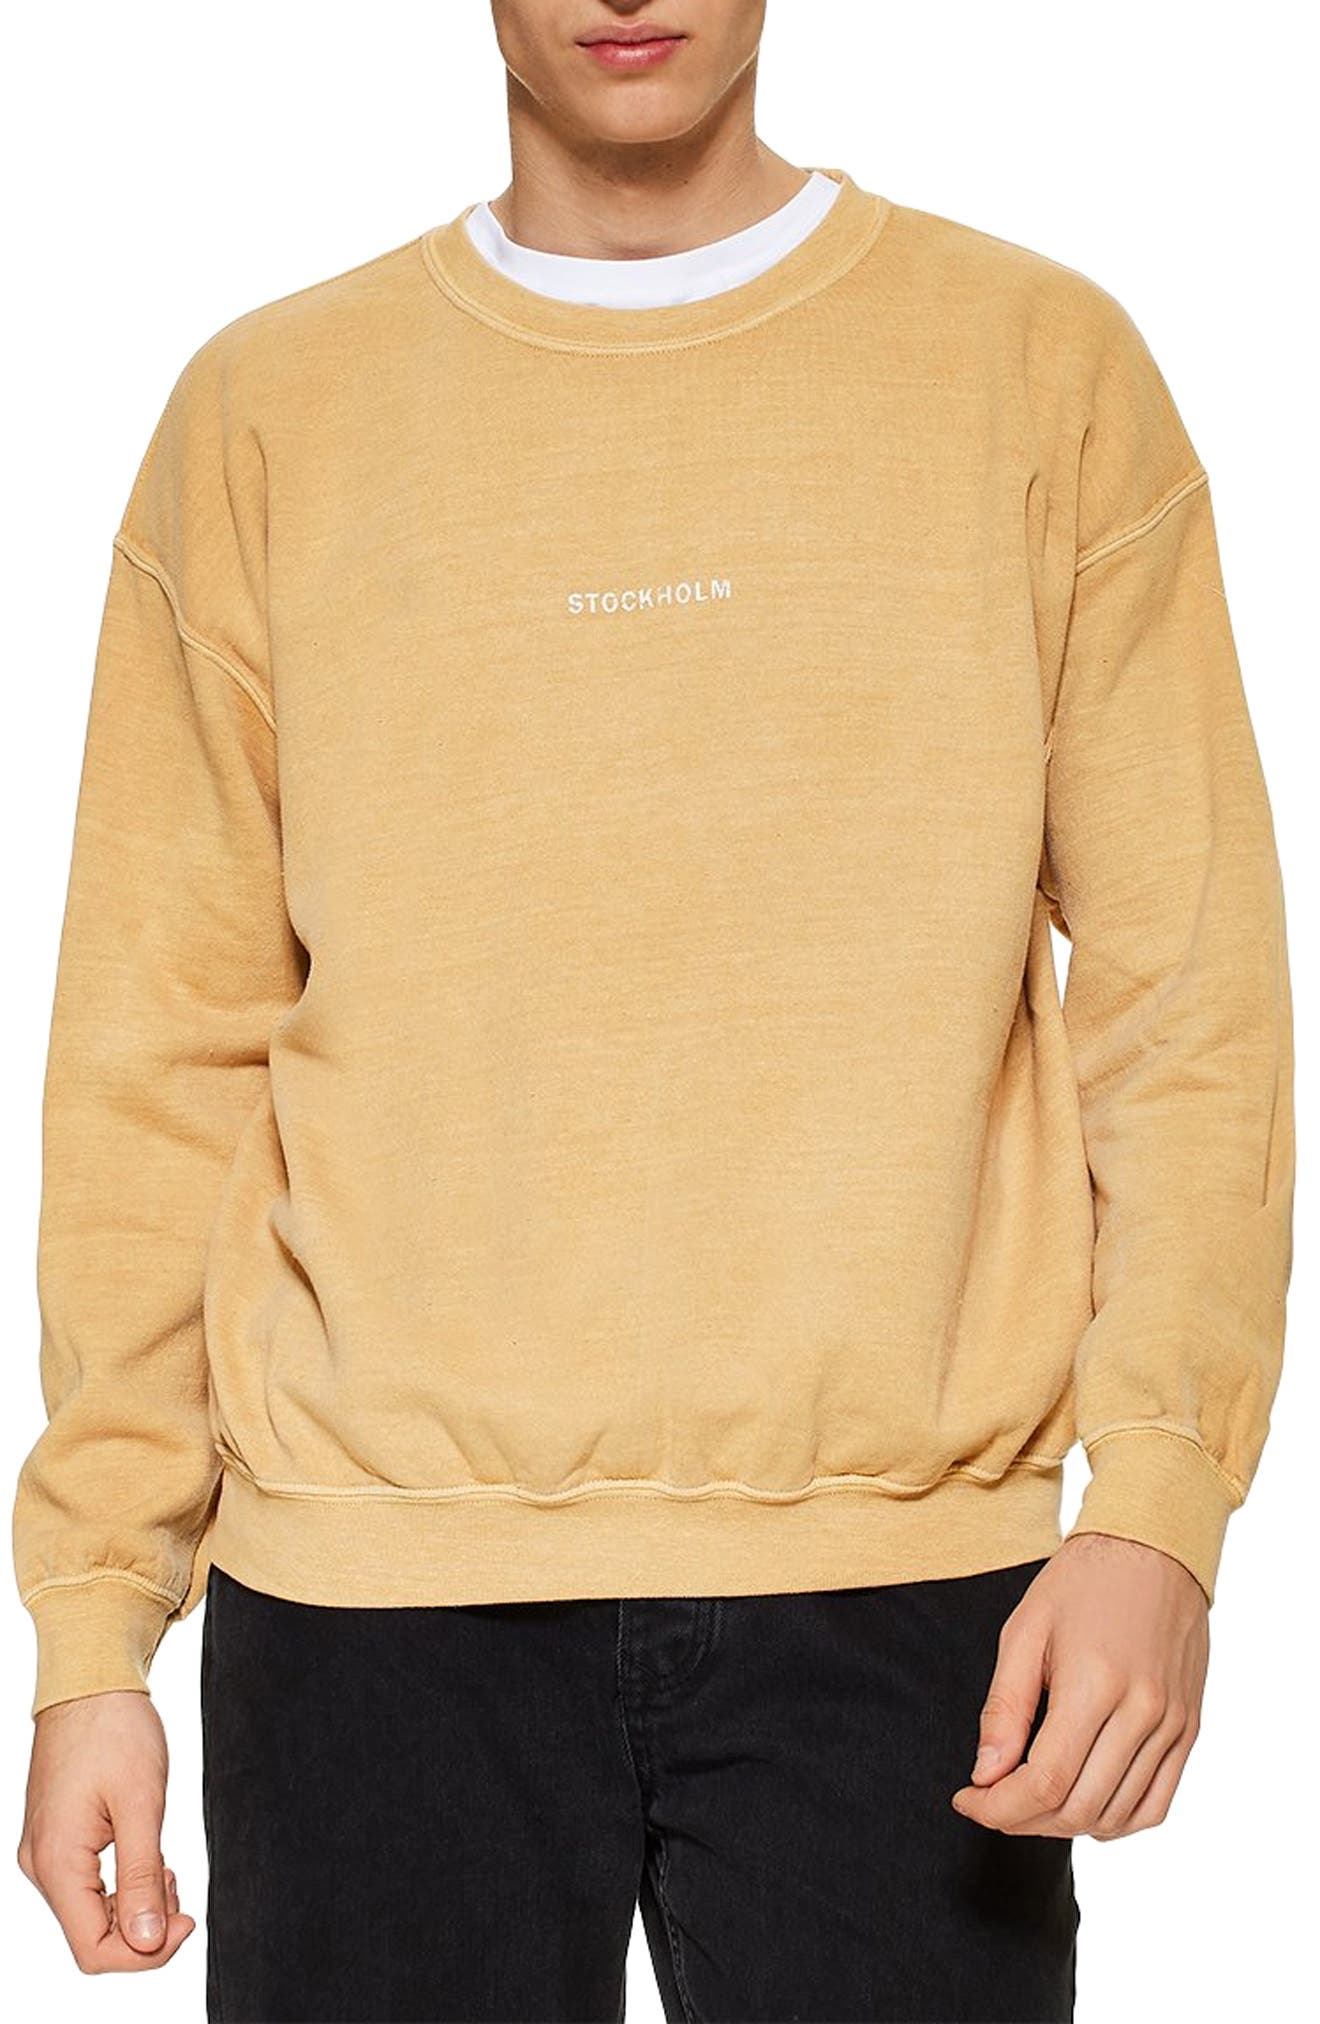 TOPMAN Stockholm Sweatshirt, Main, color, YELLOW